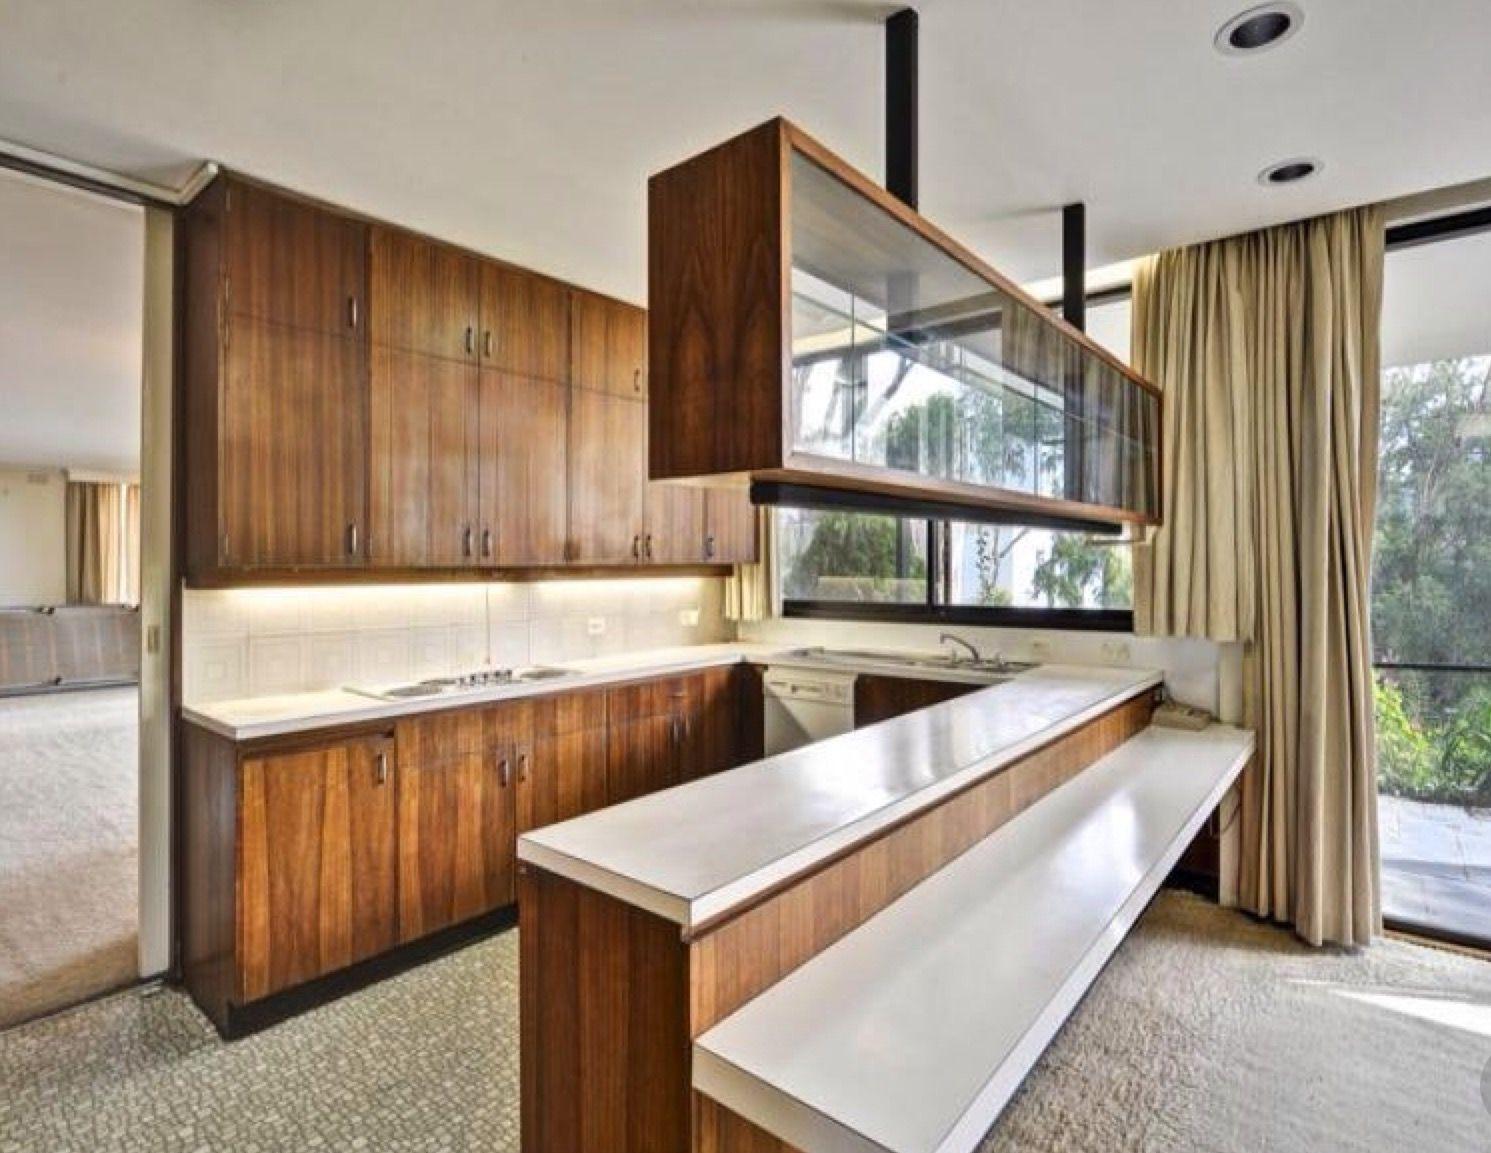 Home Home Kitchen Design Decor Hanging Kitchen Cabinets Kitchen Design Small